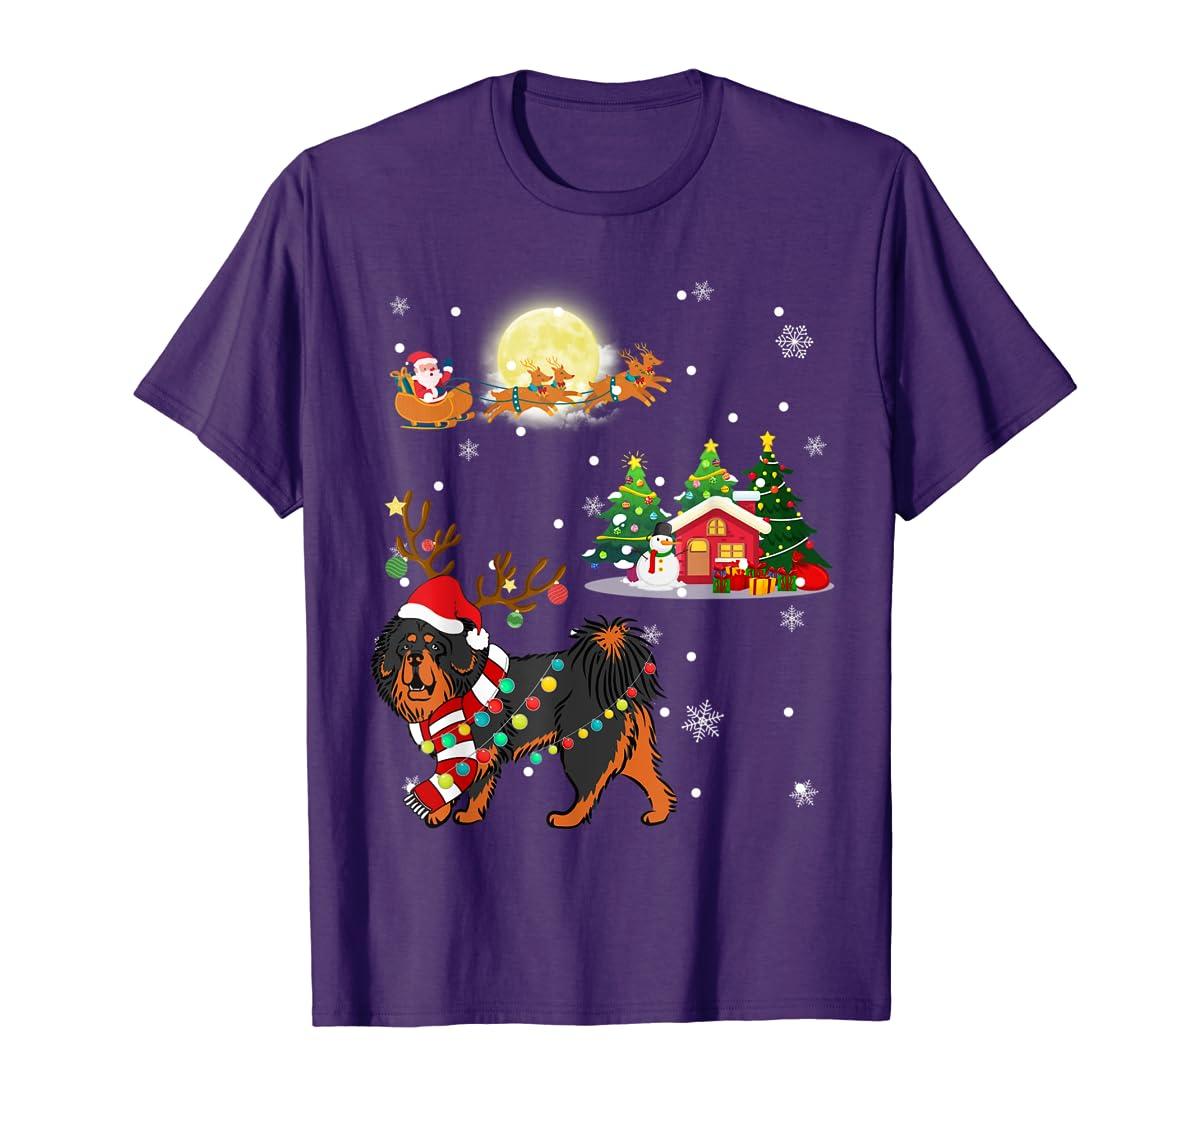 Tibetan Mastiff Dog Led Light Christmas 2019 Gift T-Shirt-Men's T-Shirt-Purple